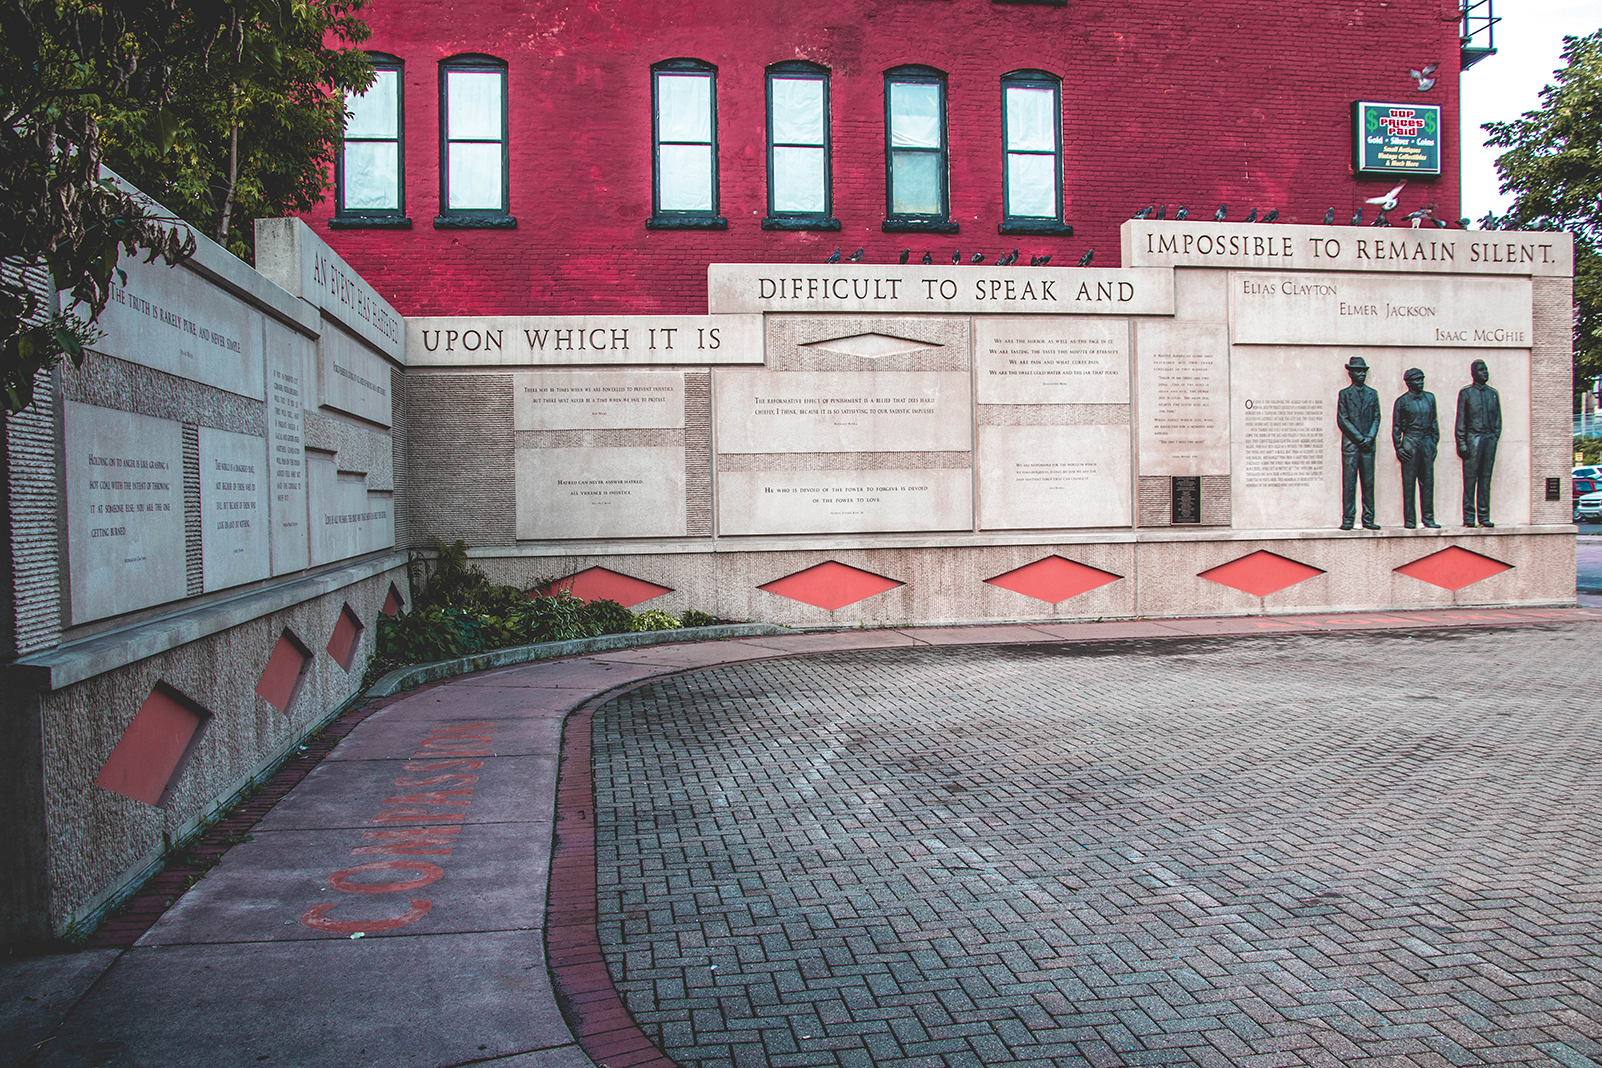 The Clayton Jackson McGhie Memorial in Duluth